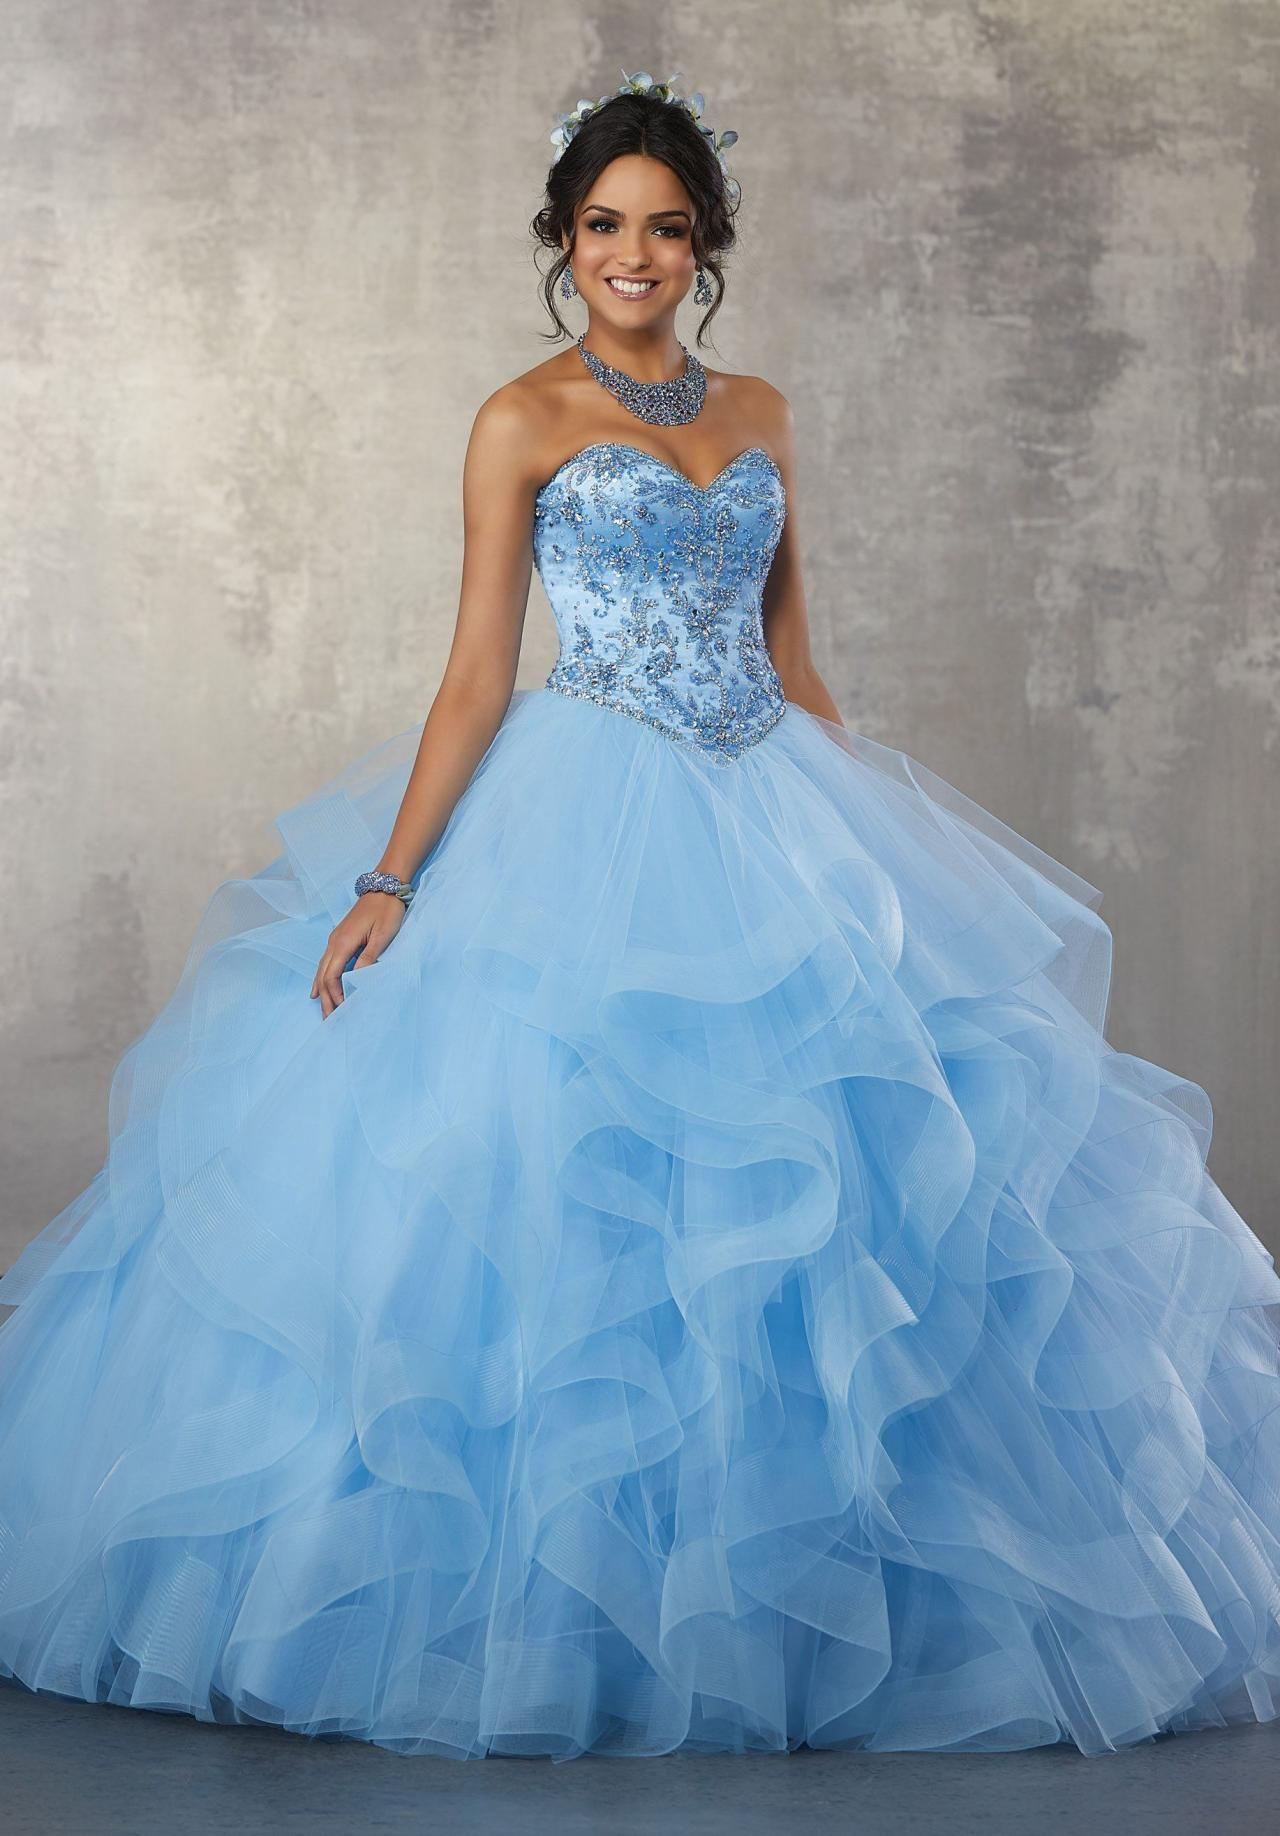 503dc238067 Strapless Ruffled Quinceanera Dress